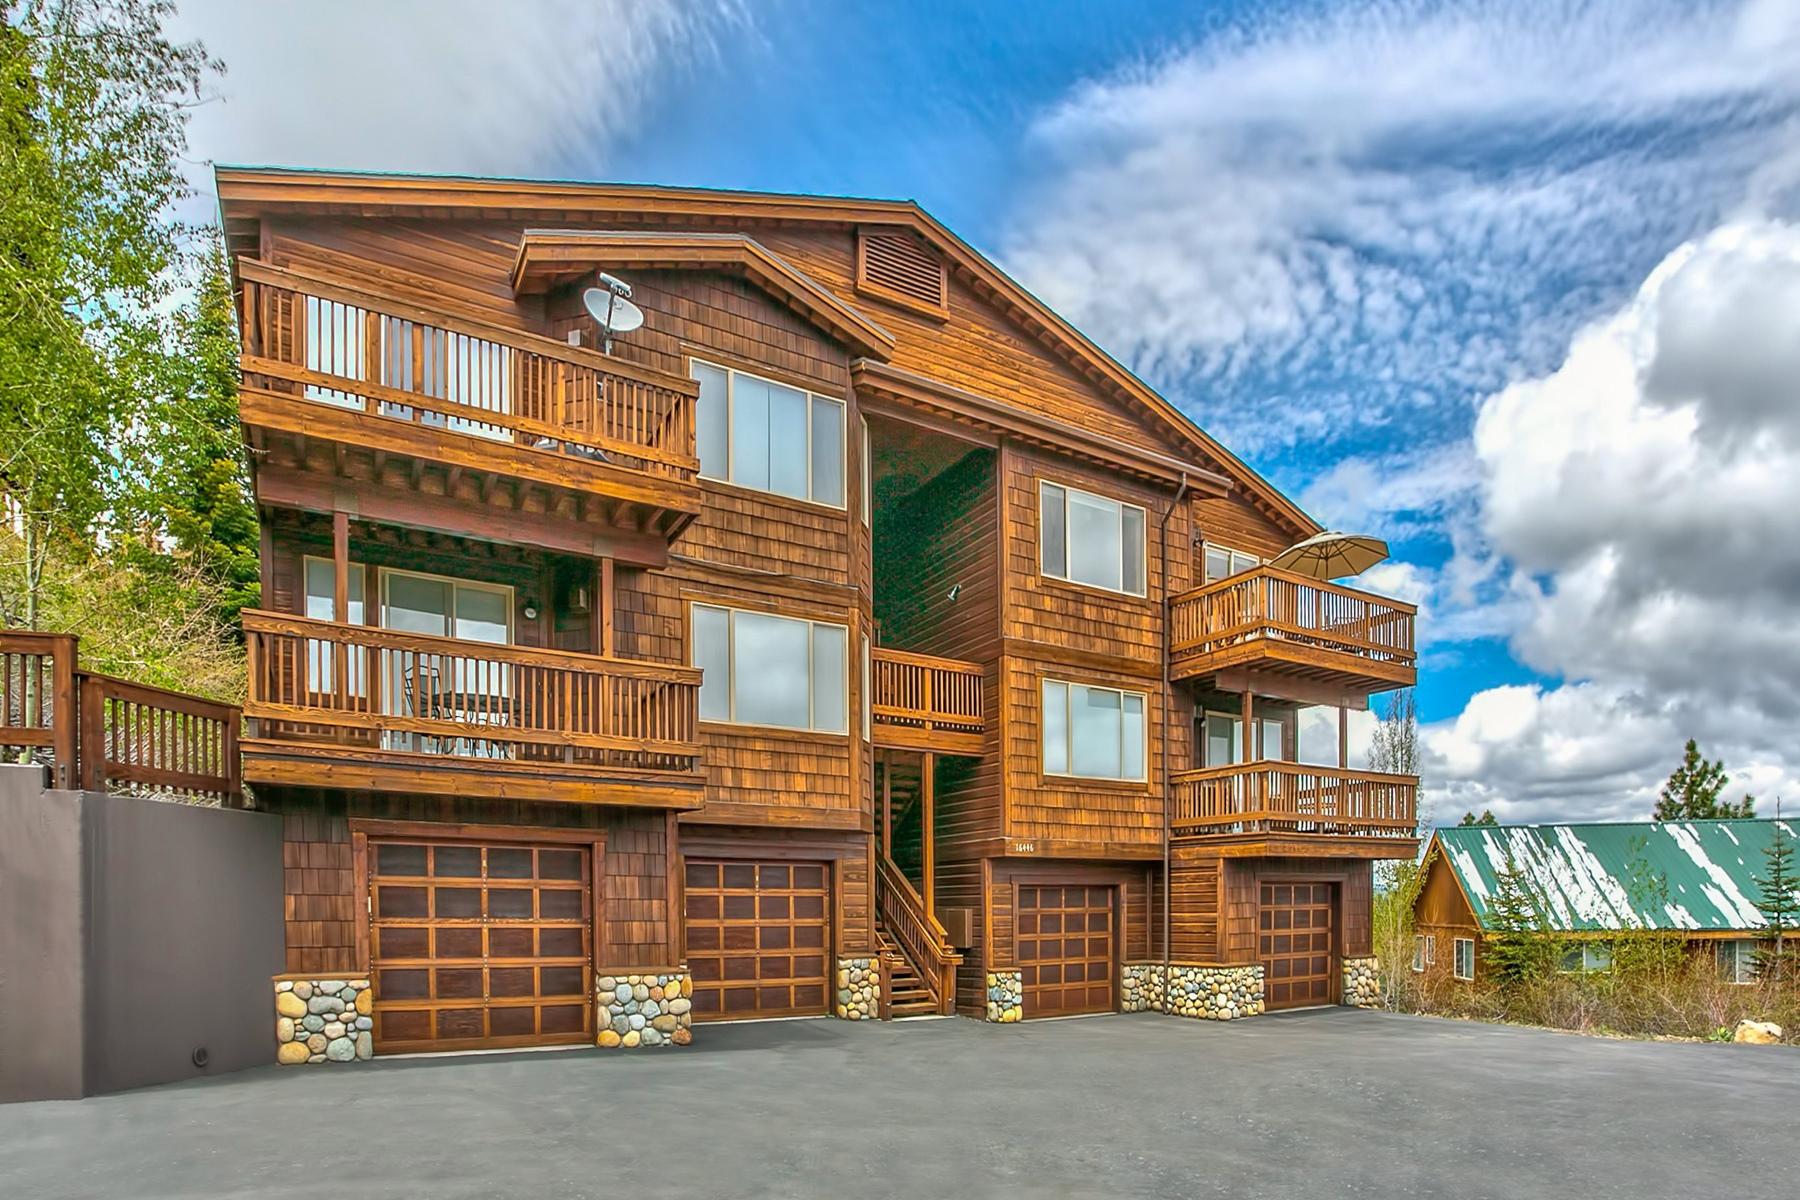 Condominium for Active at 16446 Ski Slope Way, #4 16446 Ski Slope Way #4 Truckee, California 96161 United States